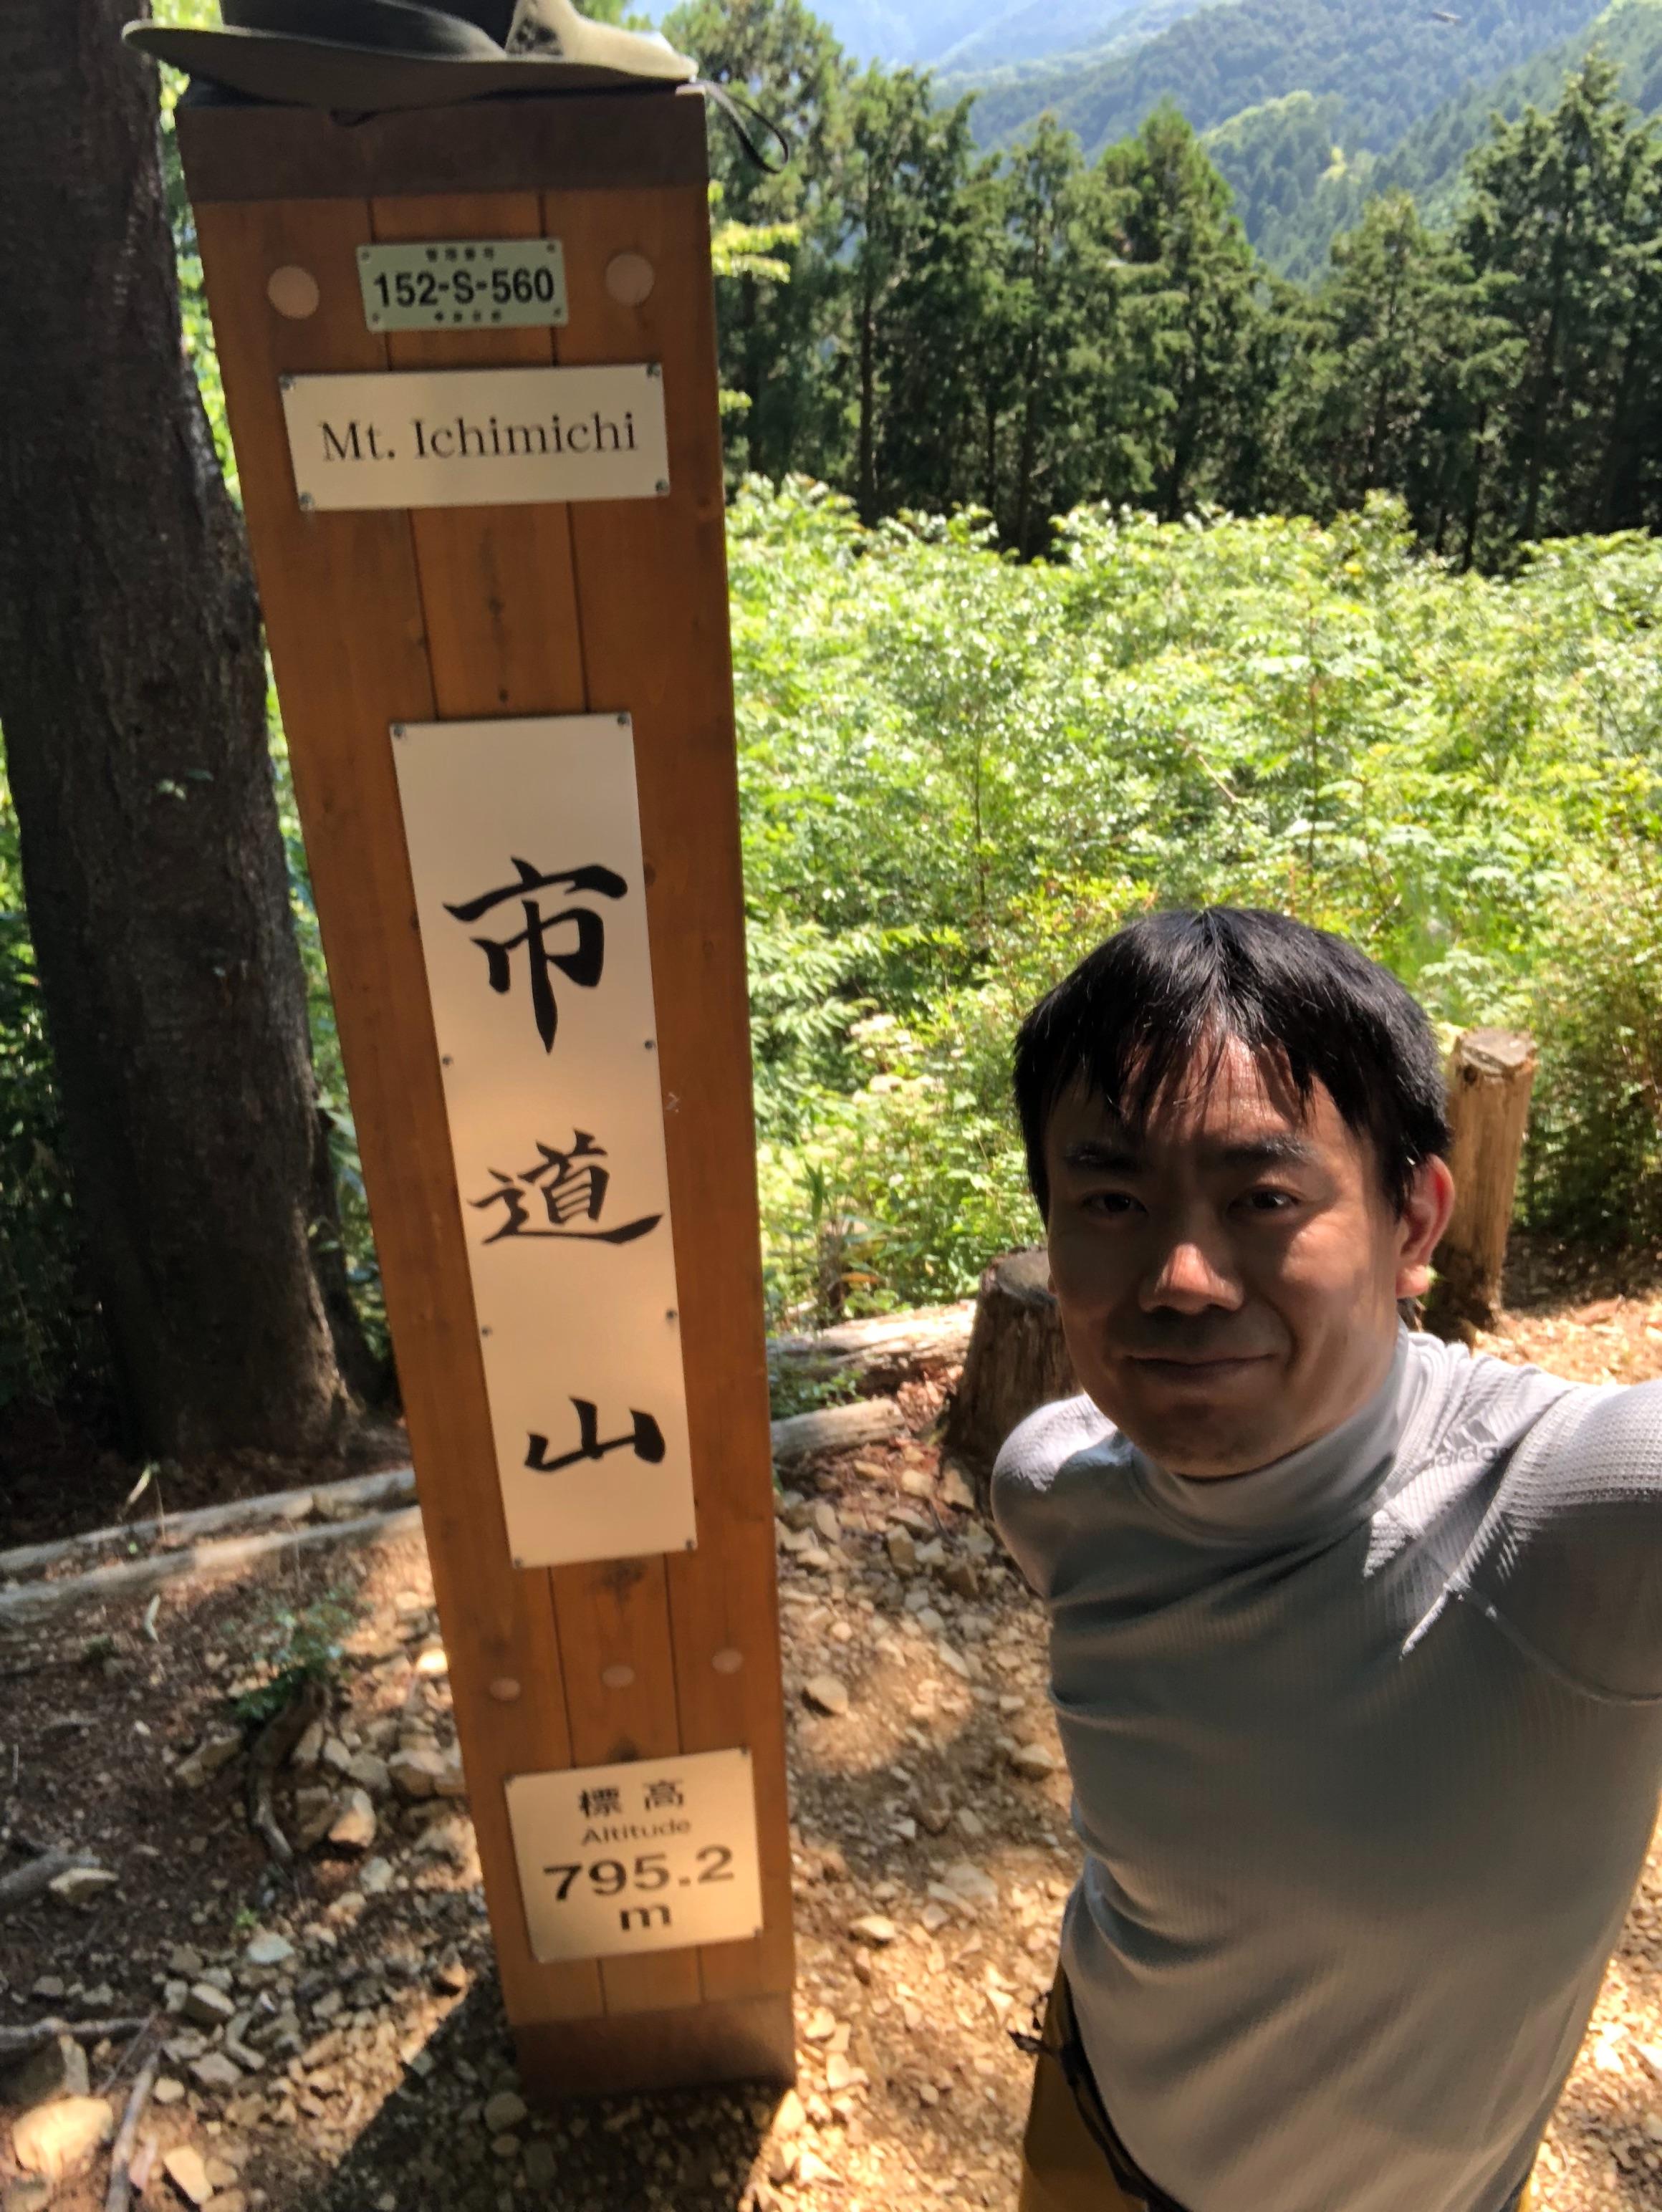 f:id:yanakahachisuke:20180605003501j:image